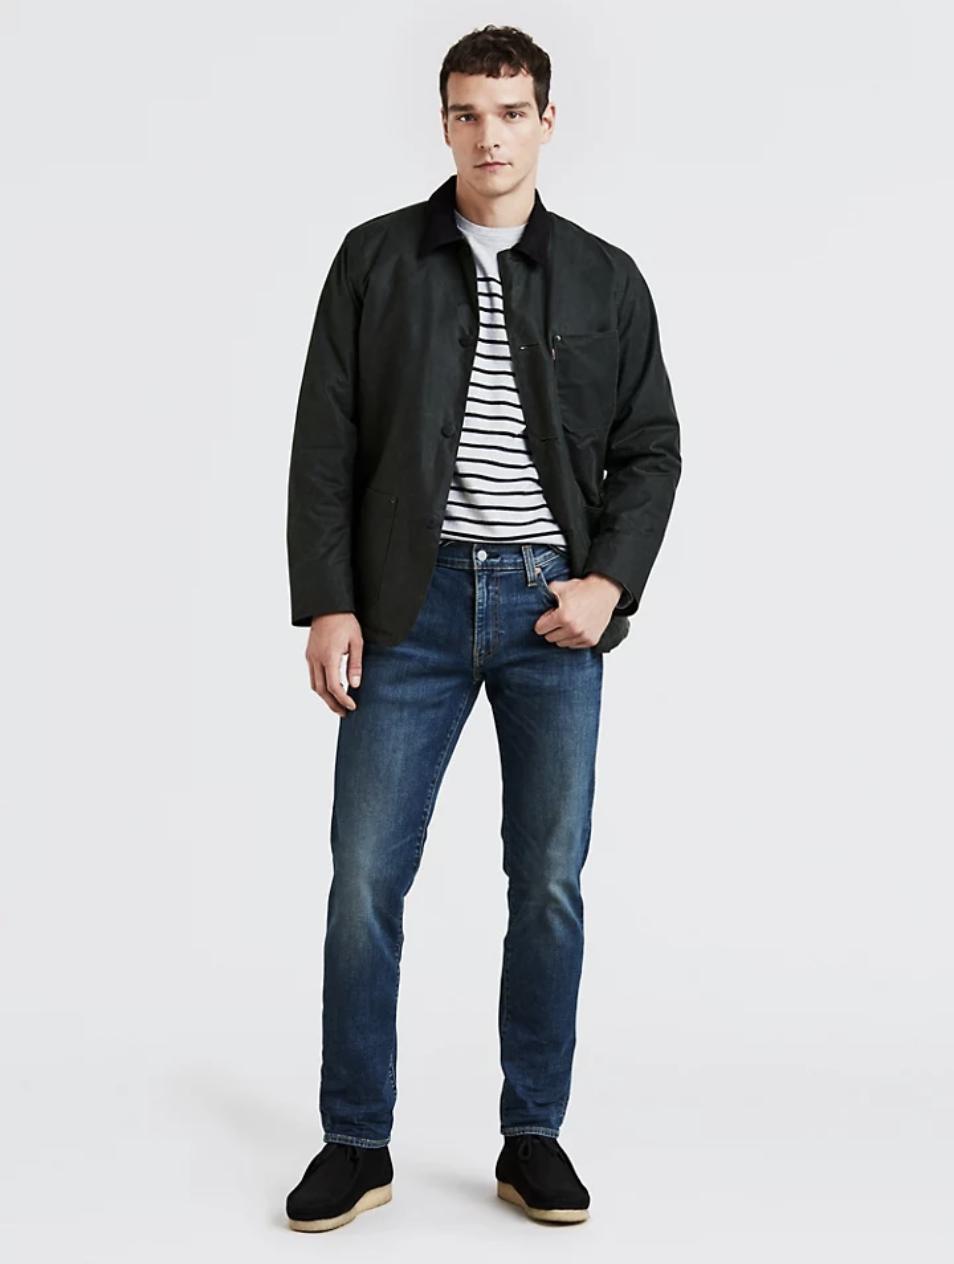 Model in a pair of dark wash boot cut denim jeans